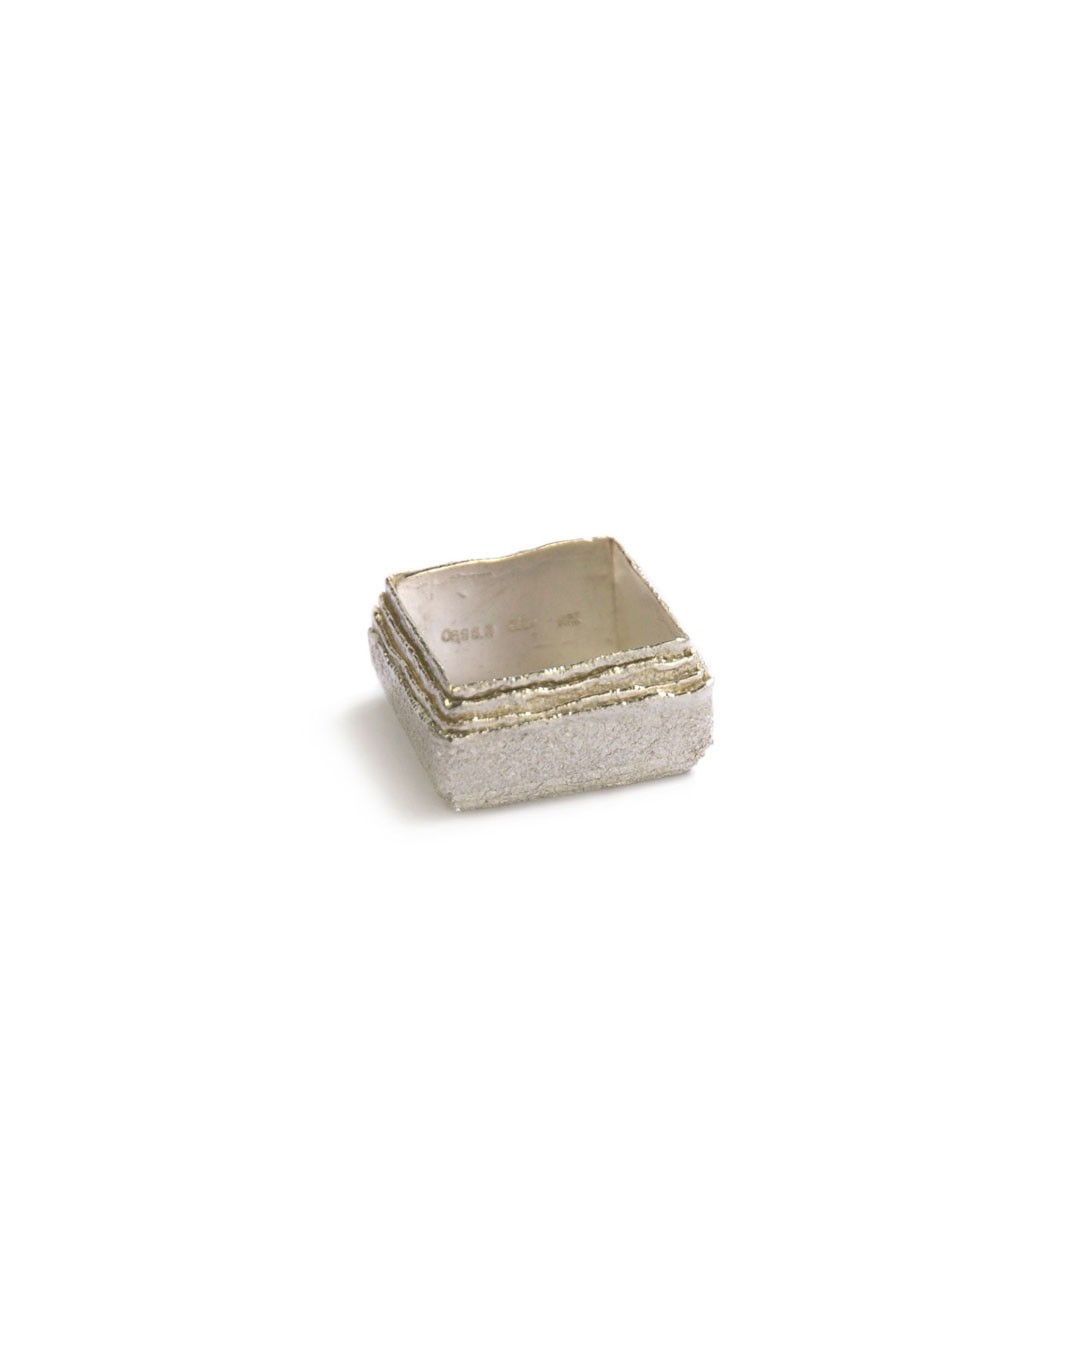 Okinari Kurokawa, untitled, 2006, ring; 970 silver, 22 x 22 x 12 mm, €450